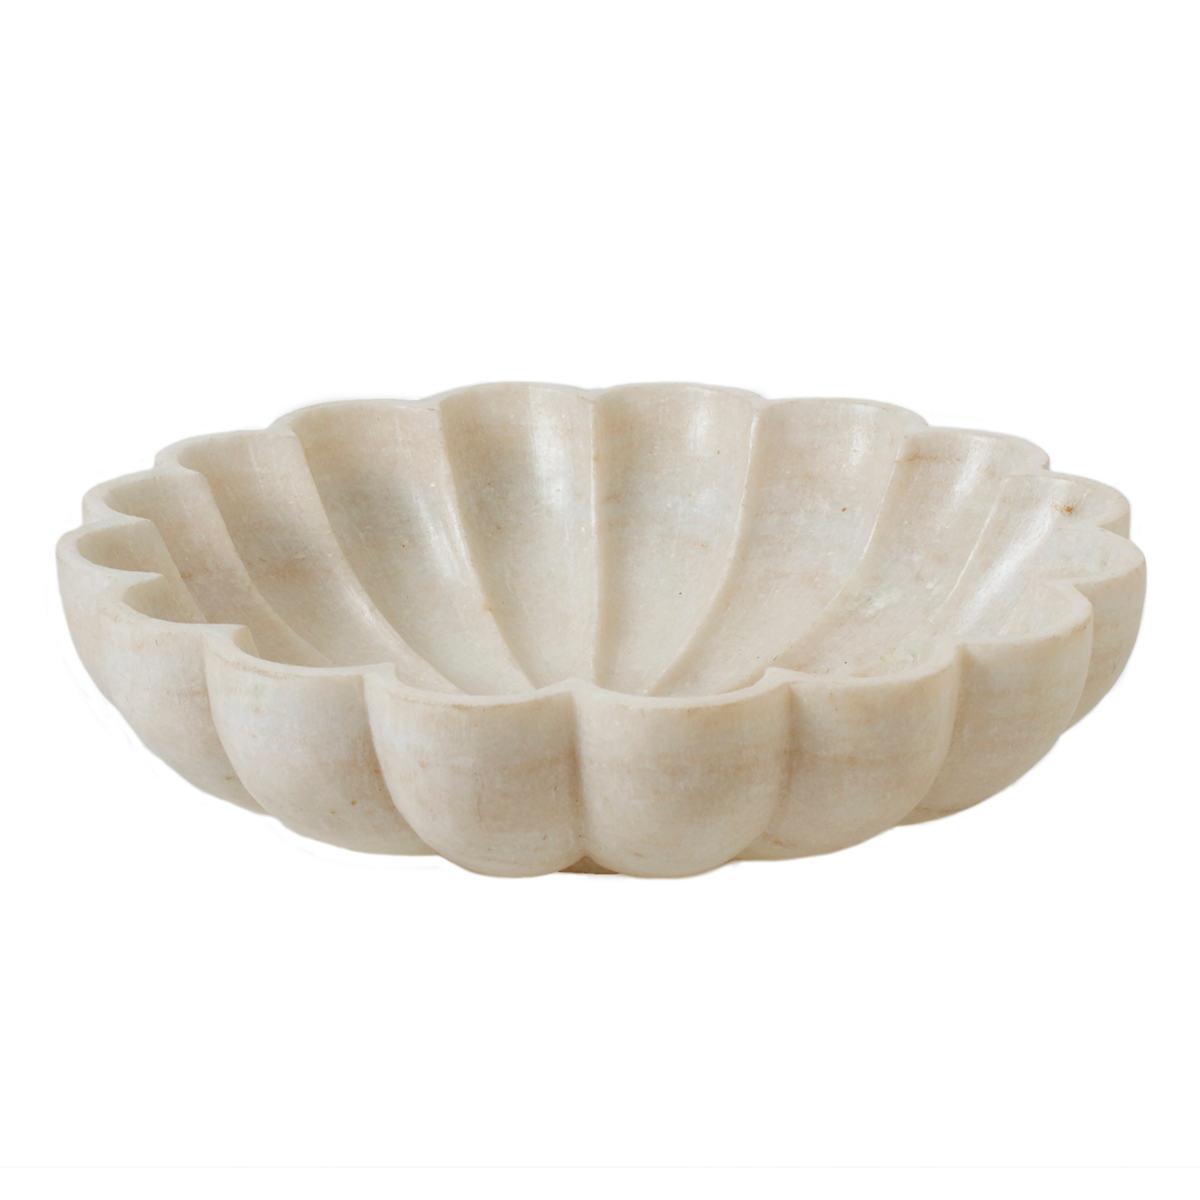 Nali Marble Bowl